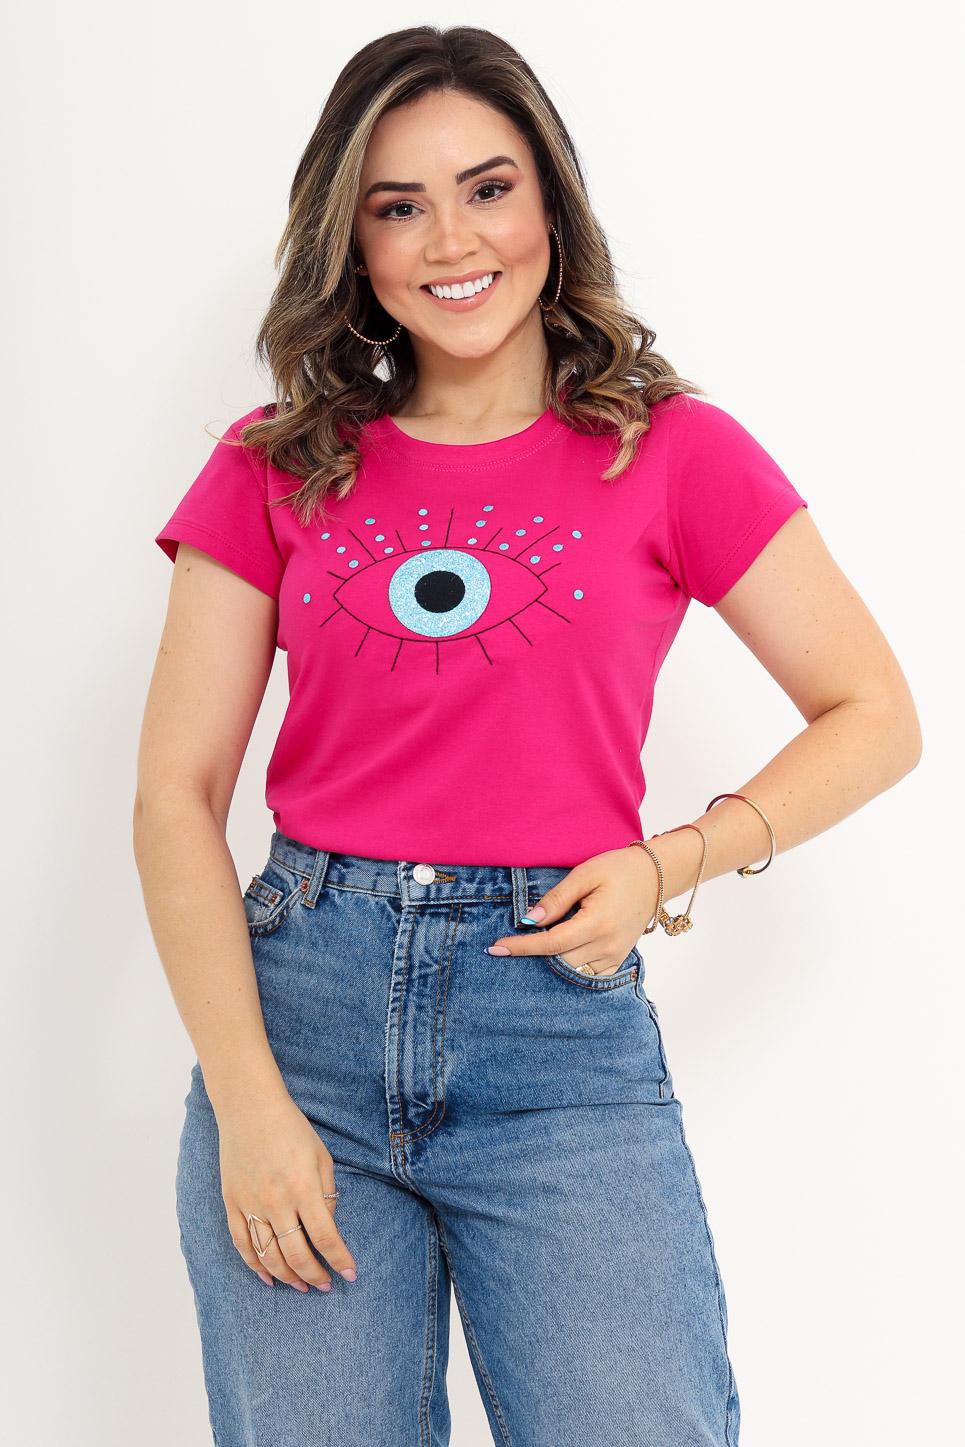 Olho Grego Bordado - Pink (zoom)